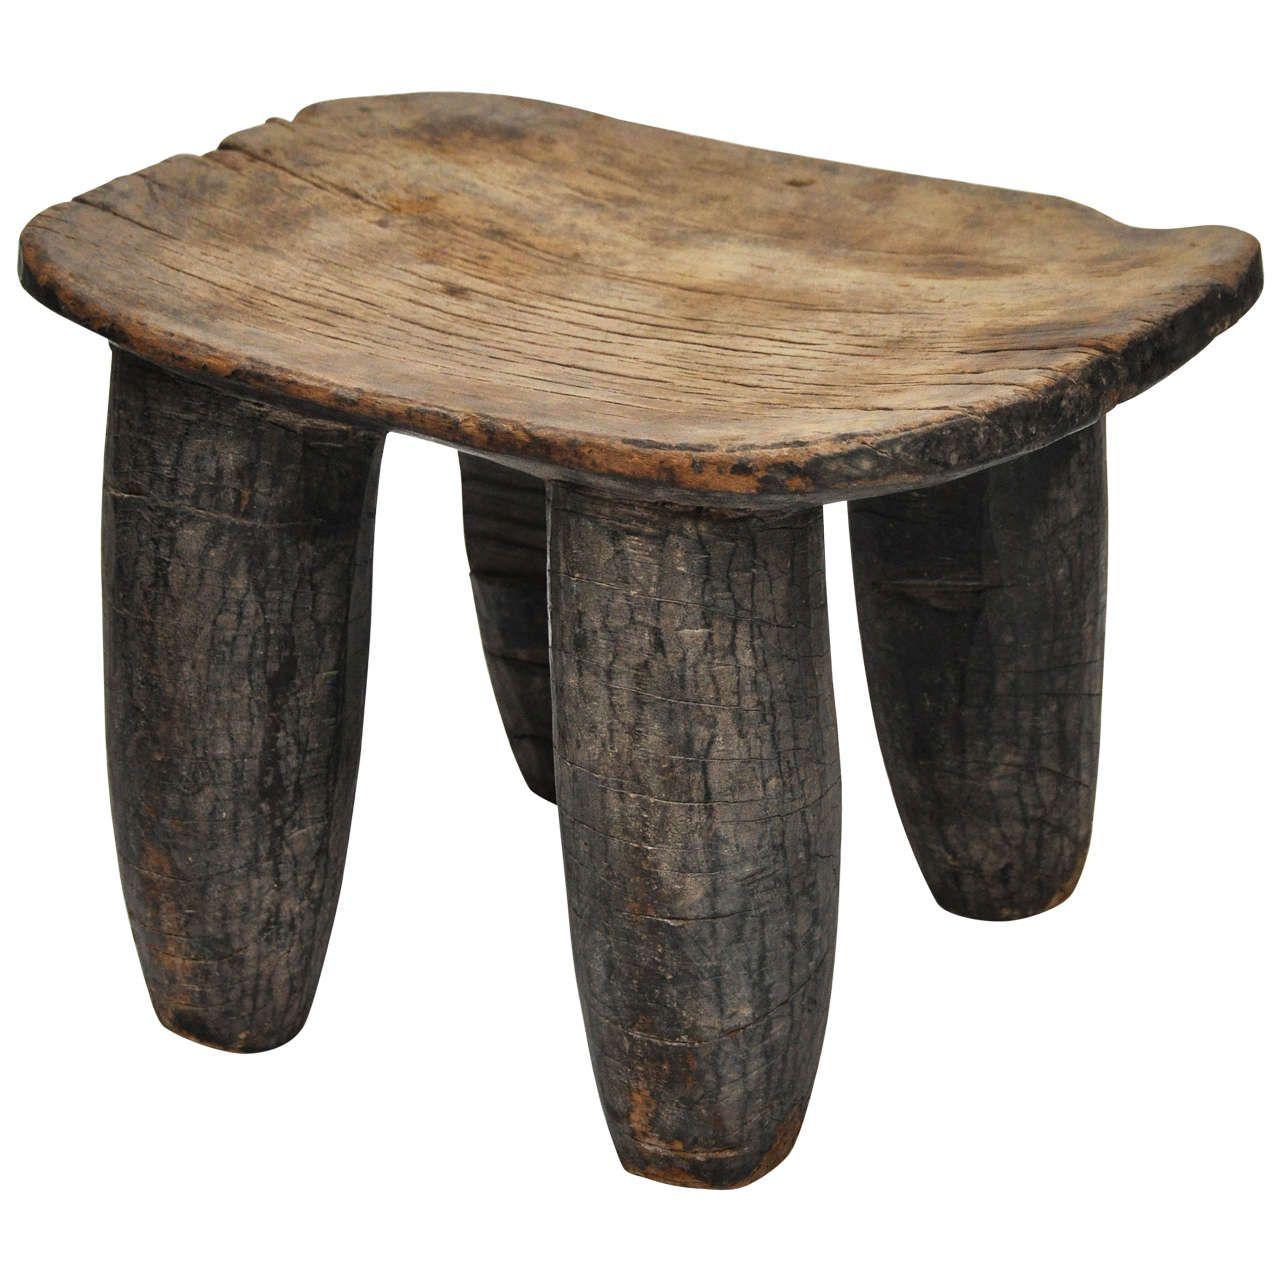 four-legged senufo african stool   holz, Wohnzimmer dekoo